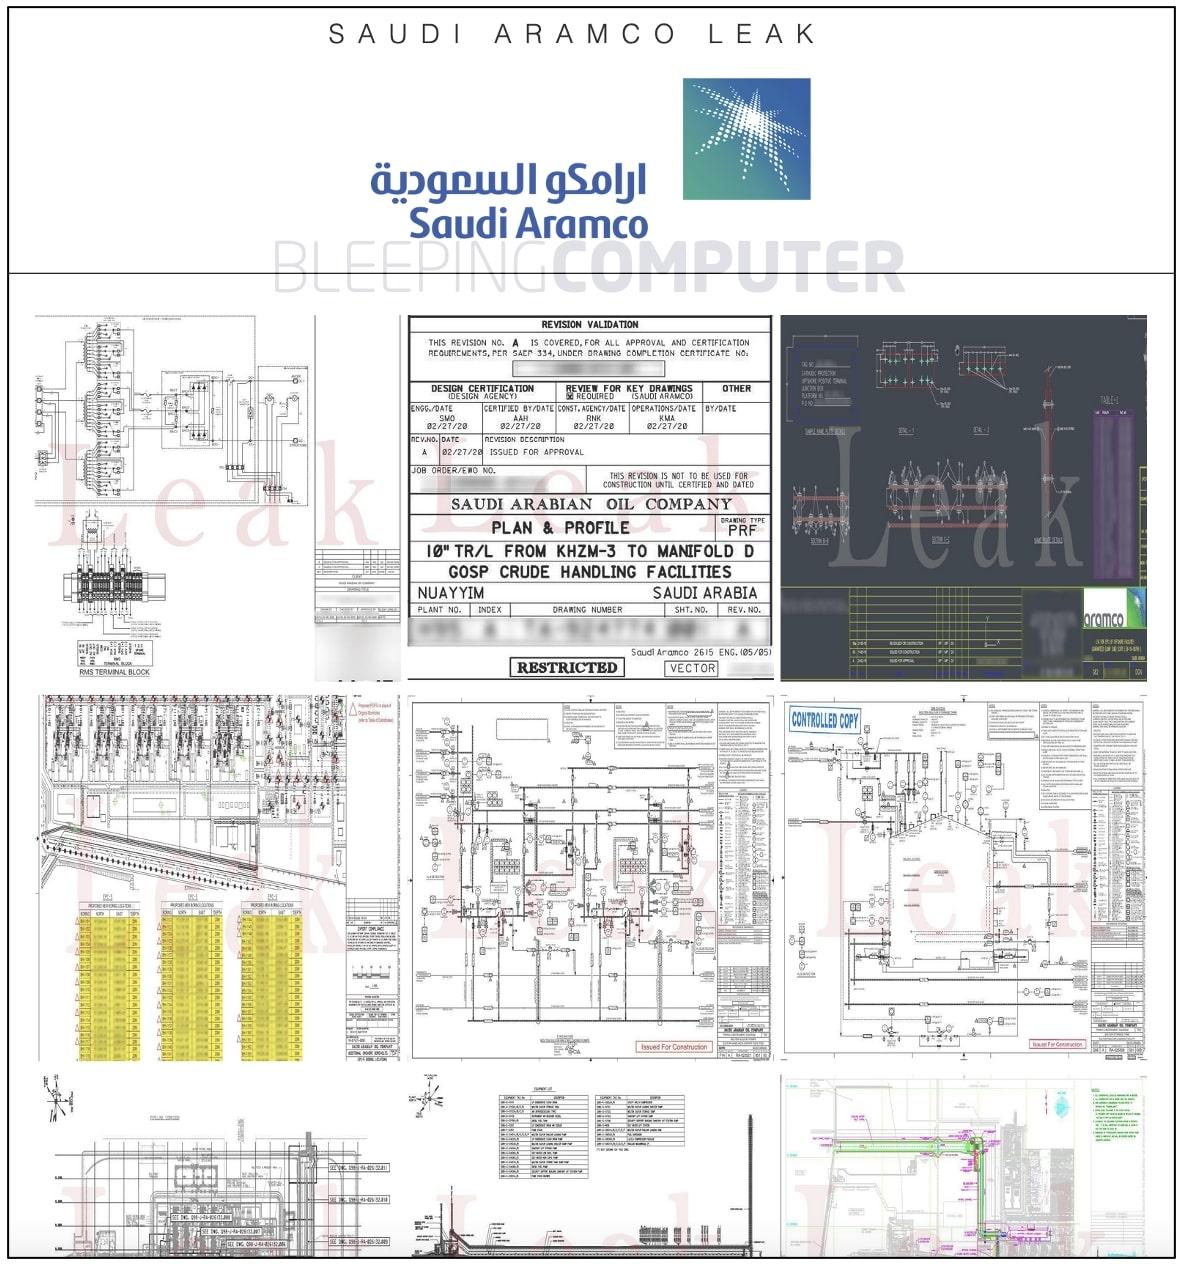 saudi aramco leak site